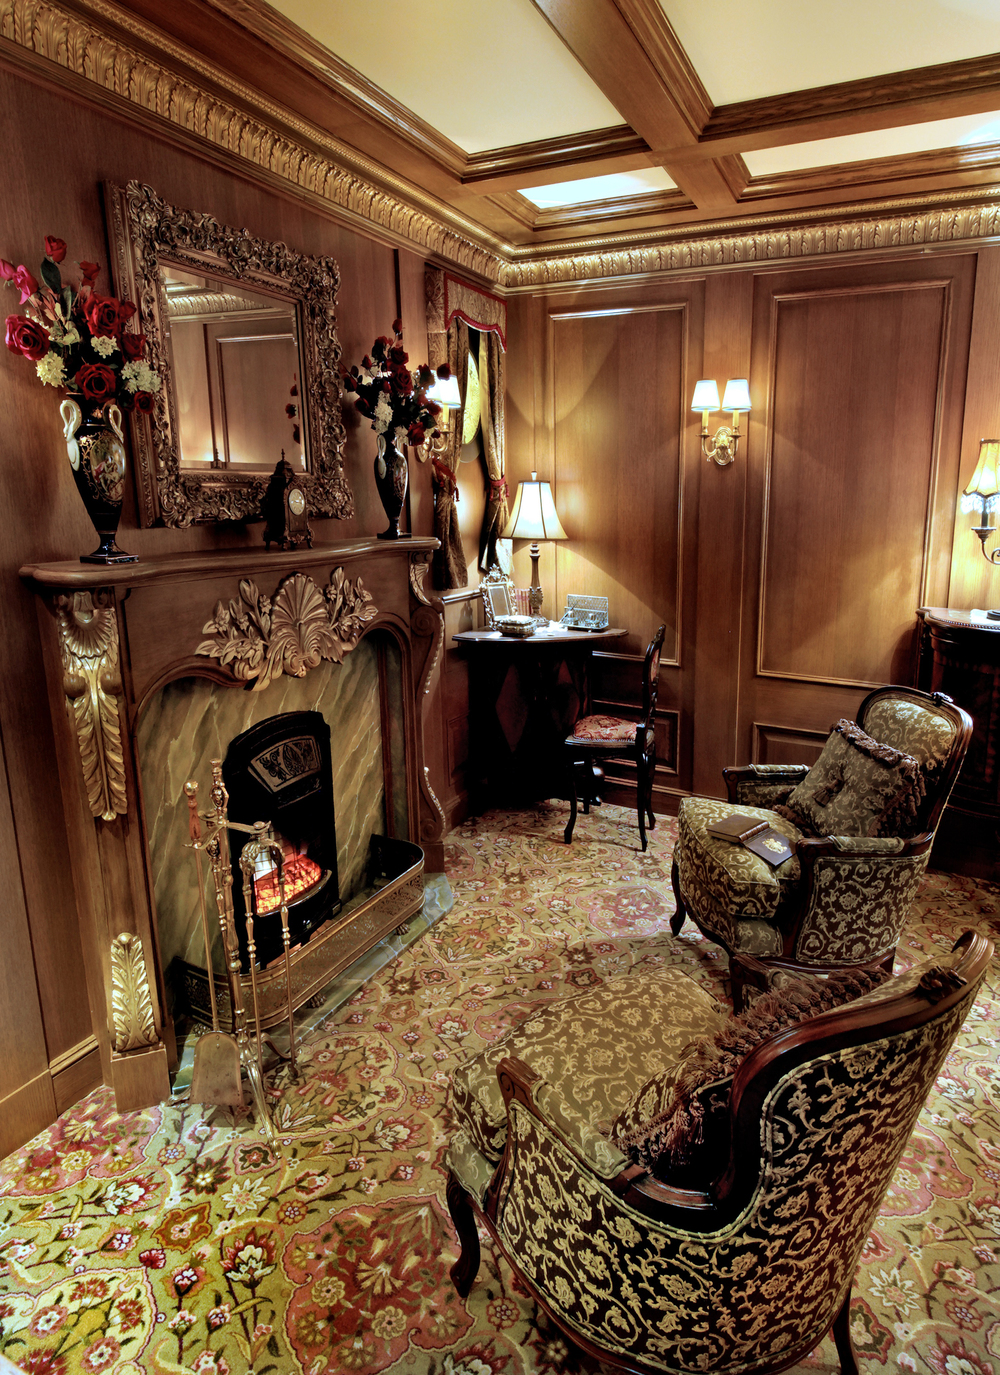 titanic-interior-first-class.jpg